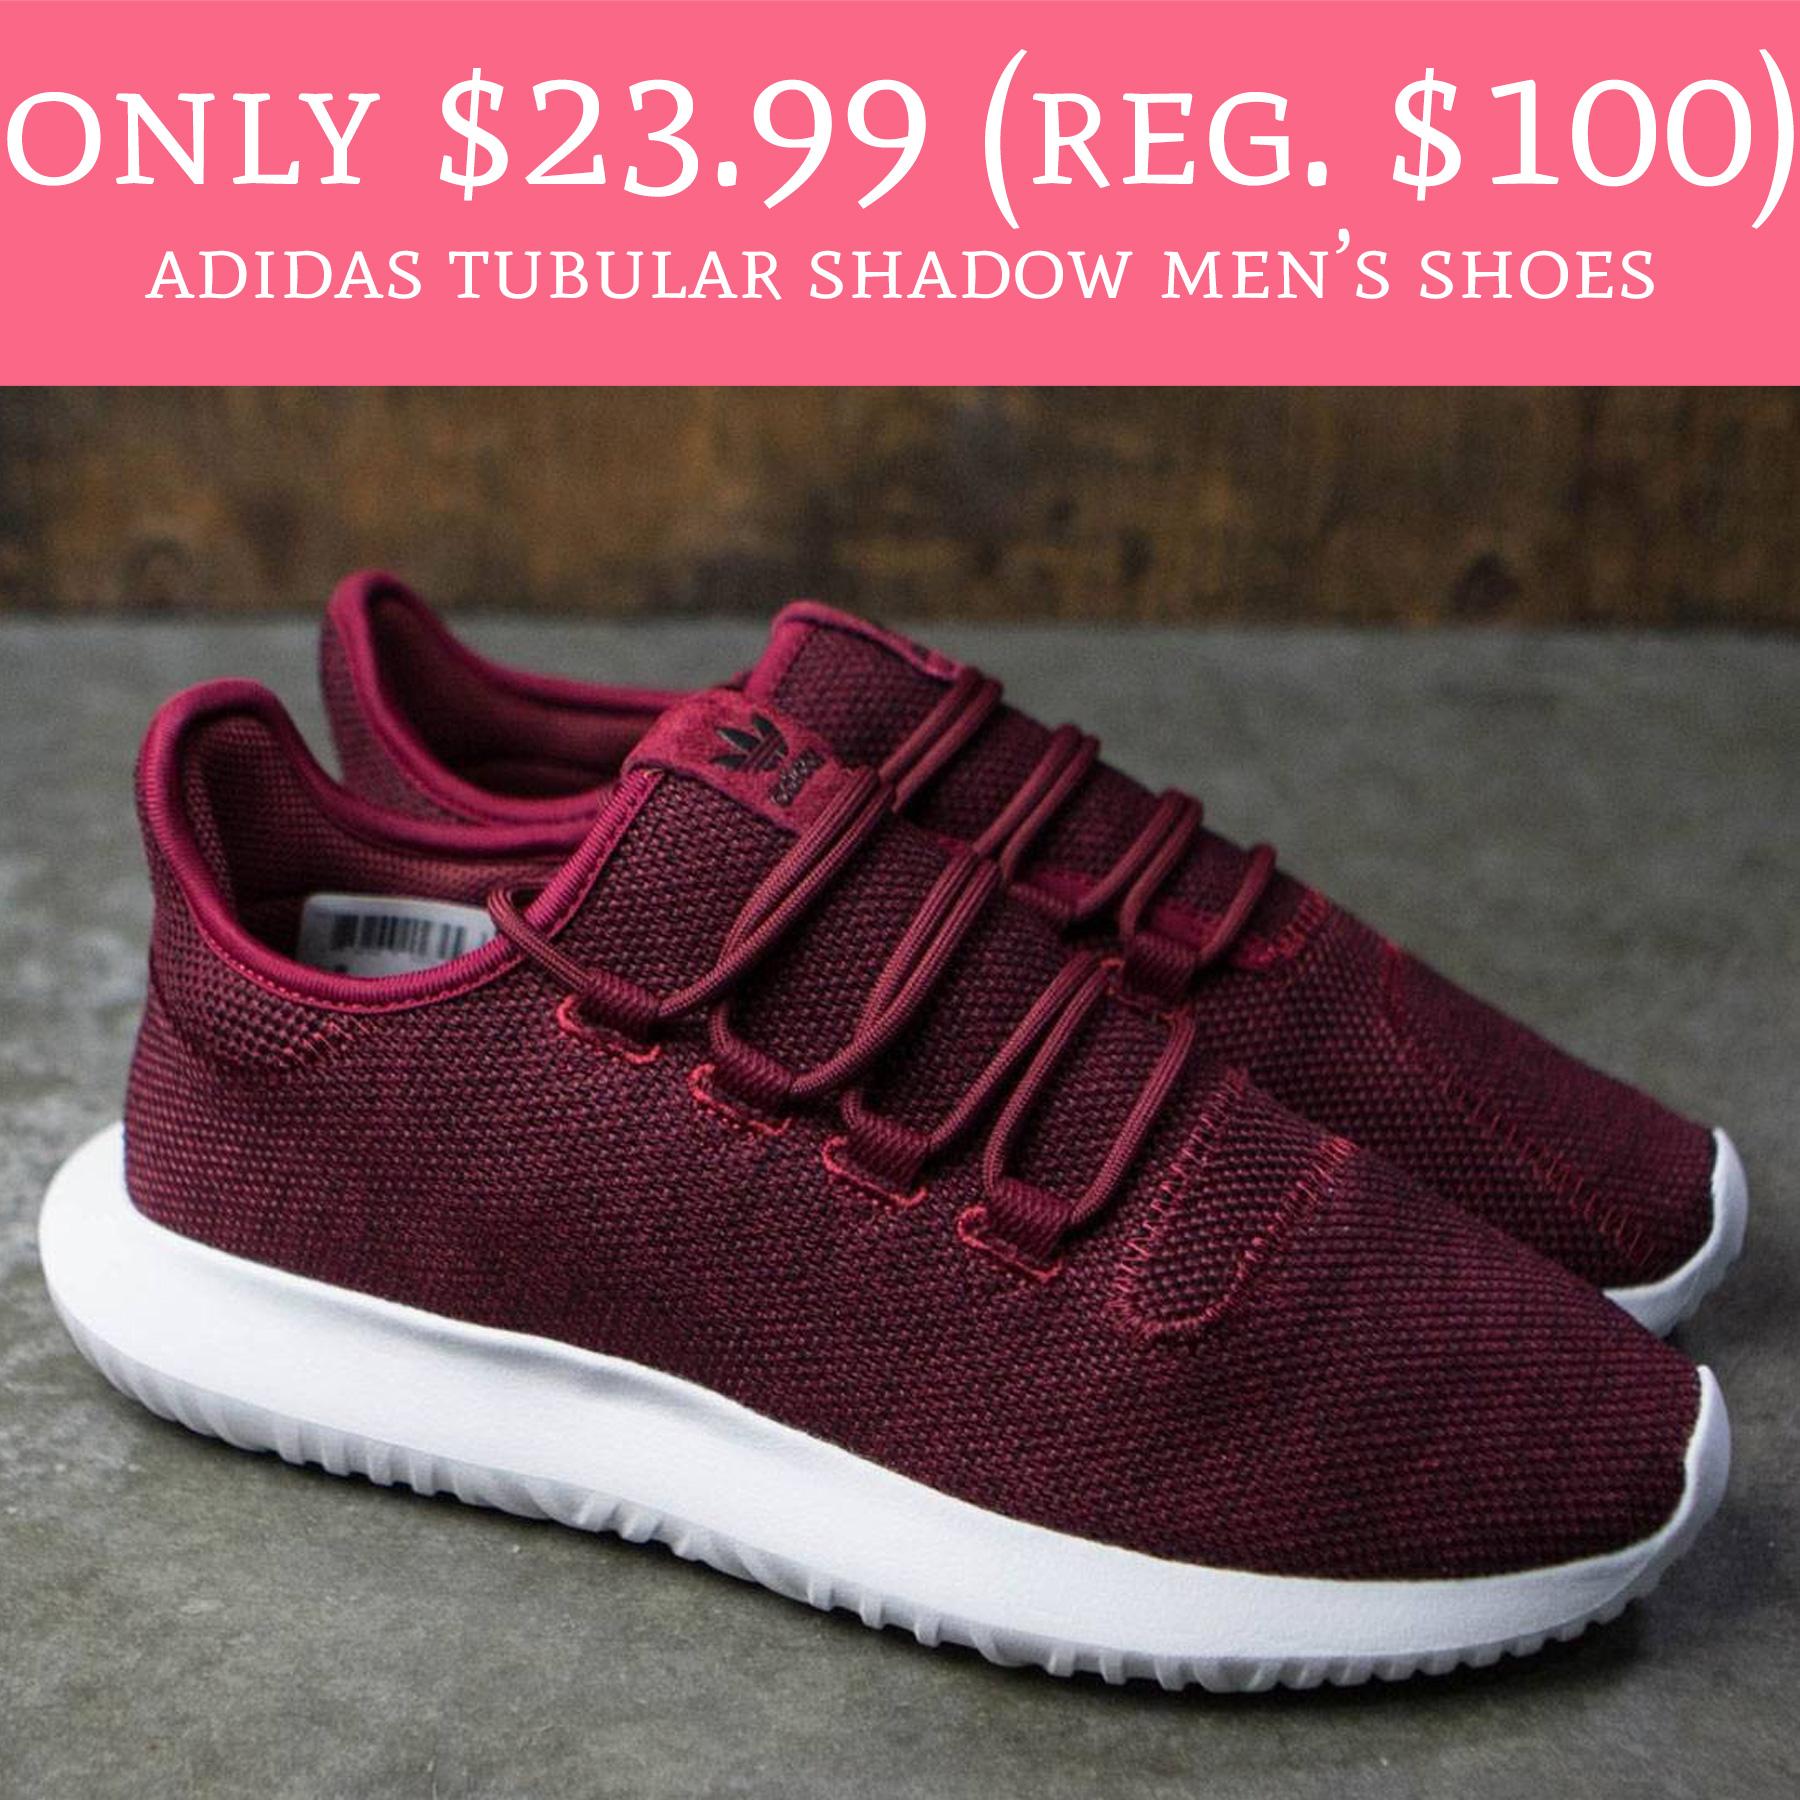 half off 79817 52459 Only $23.99 (Regular $100) Adidas Tubular Shadow Men's Shoes ...